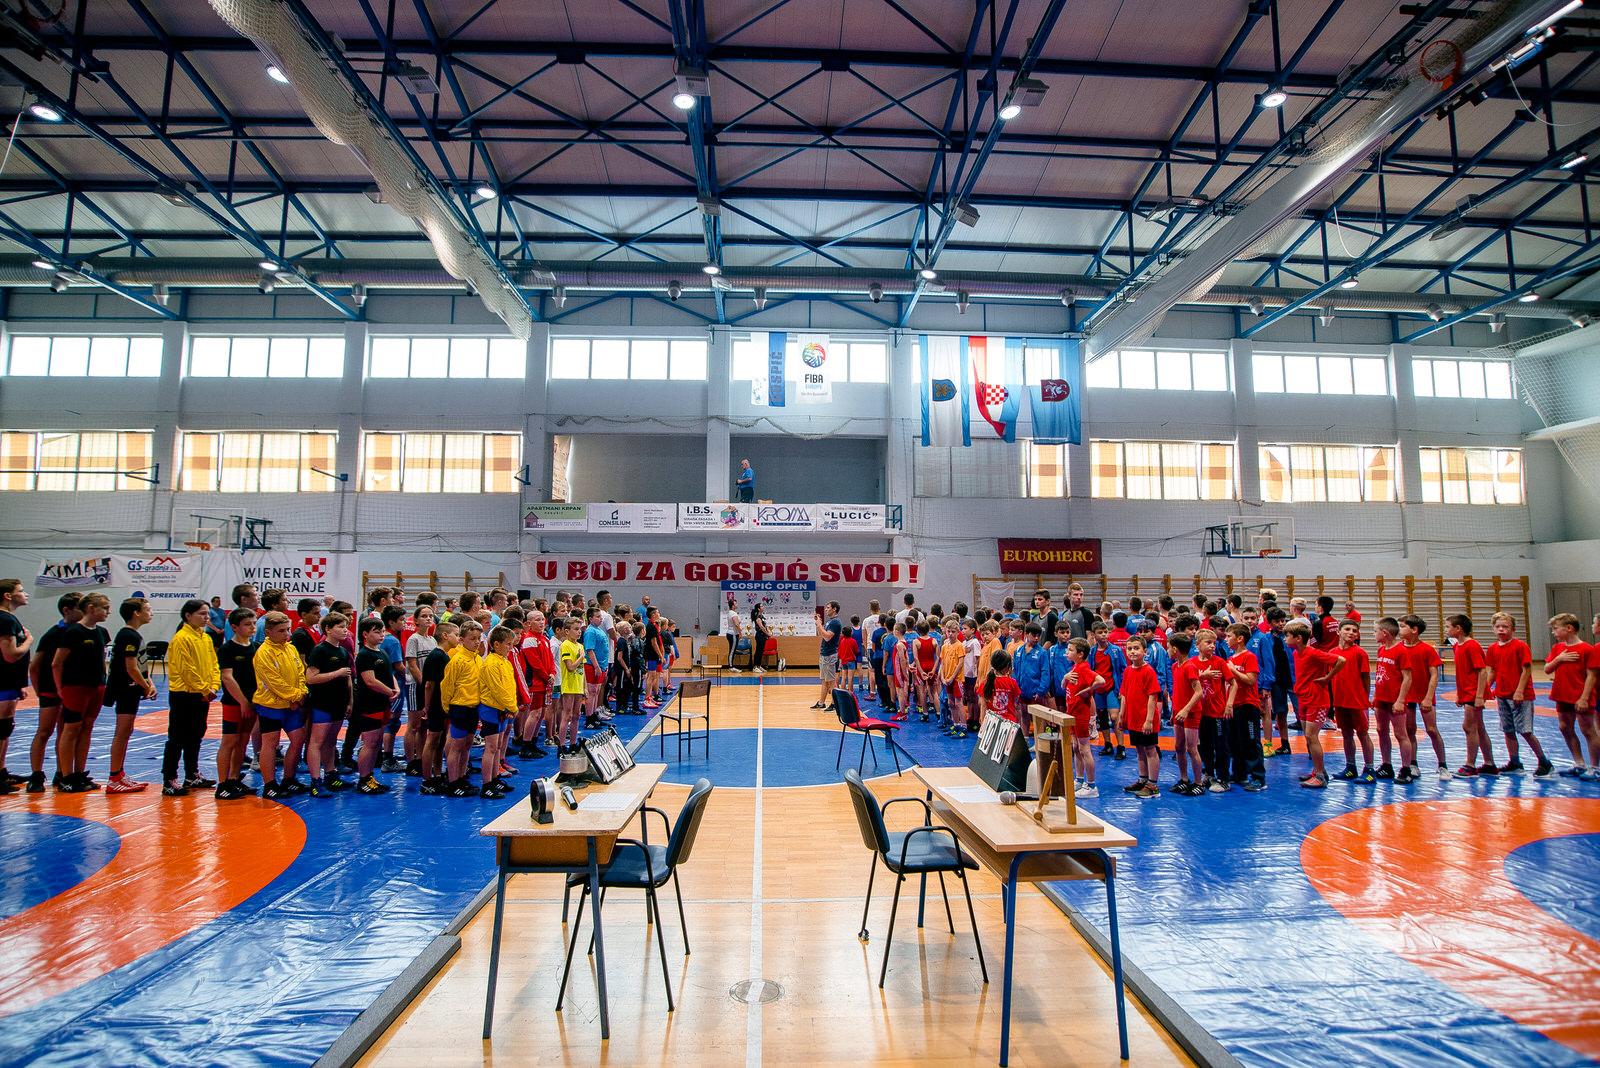 likaclub_gospić-open-hrvanje_2019-29